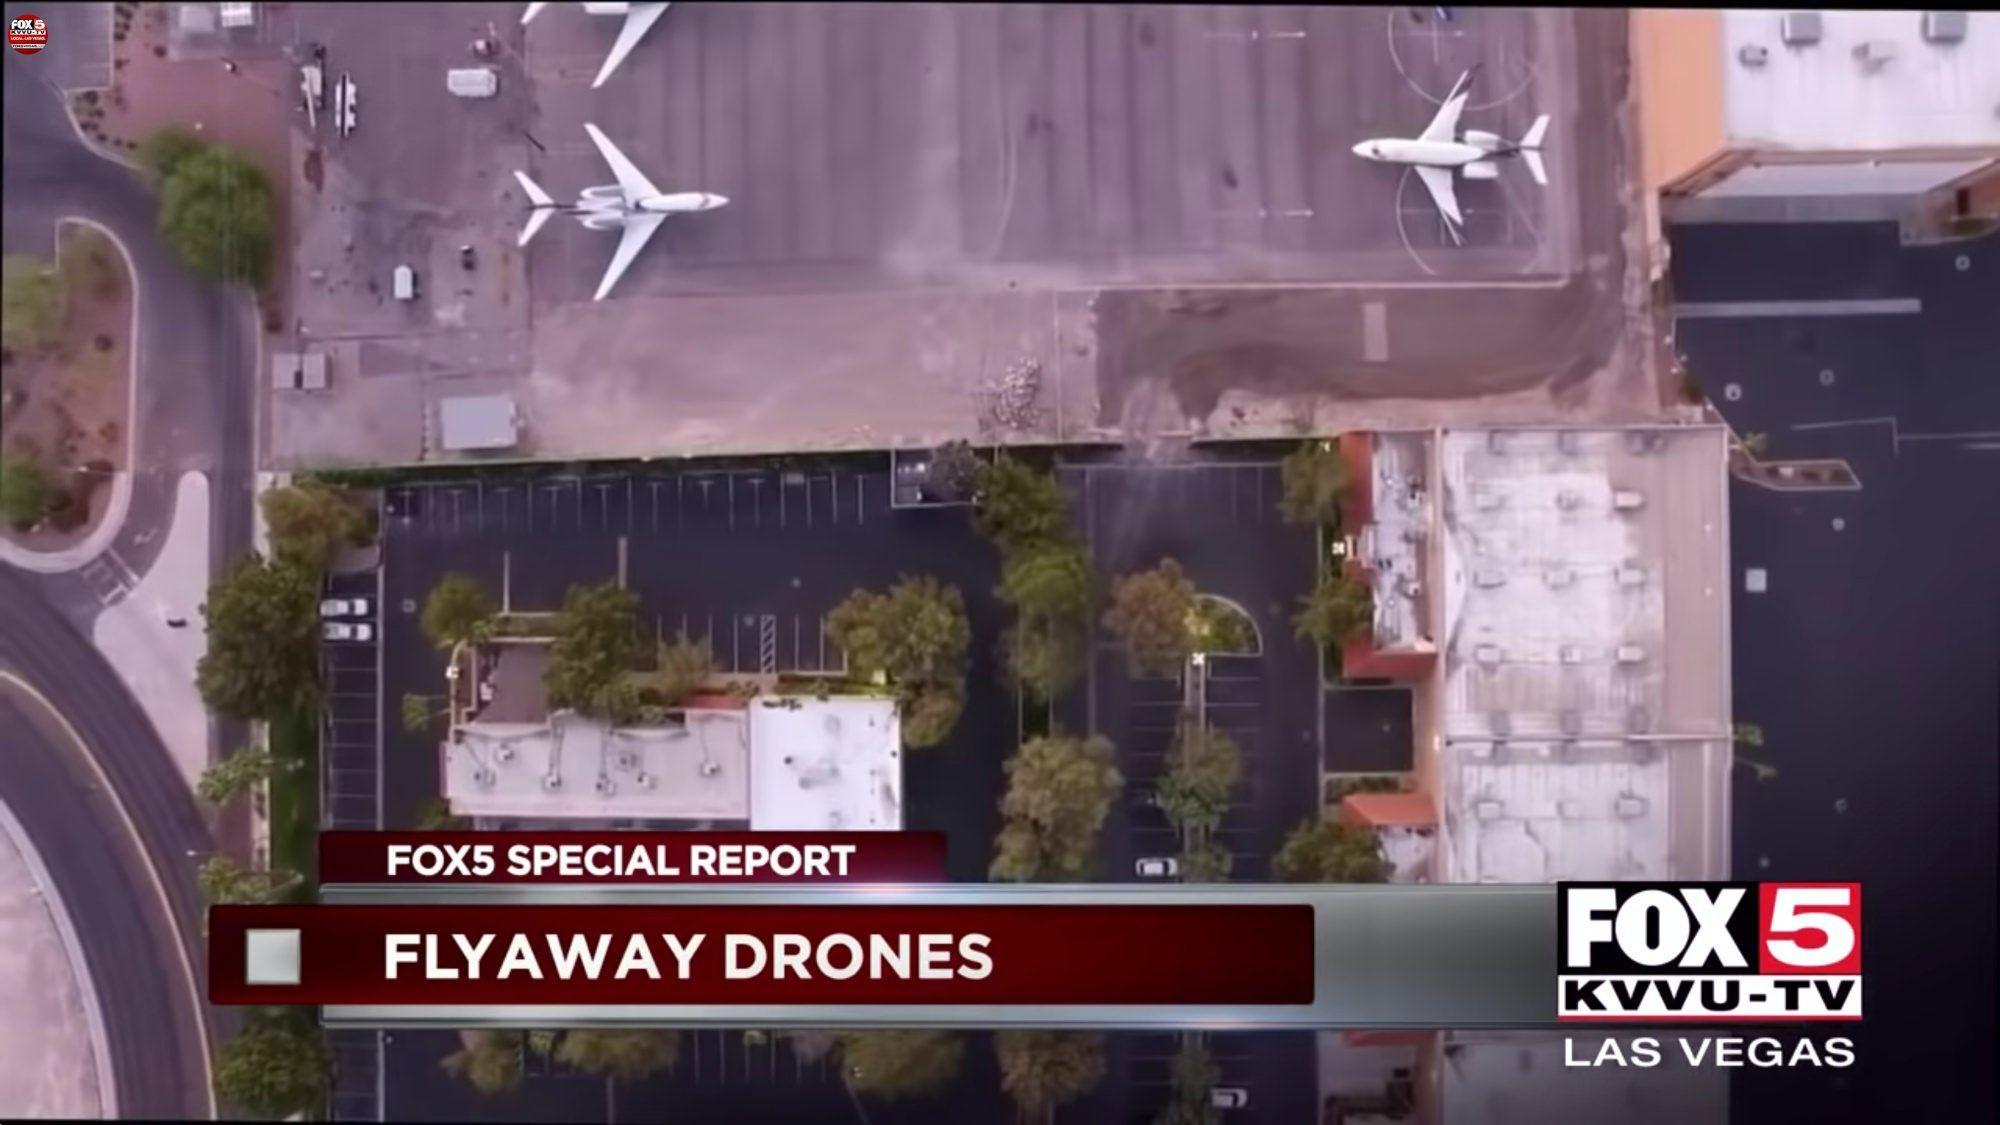 Drone pilot fined 20,000 after DJI Phantom 3 lands at